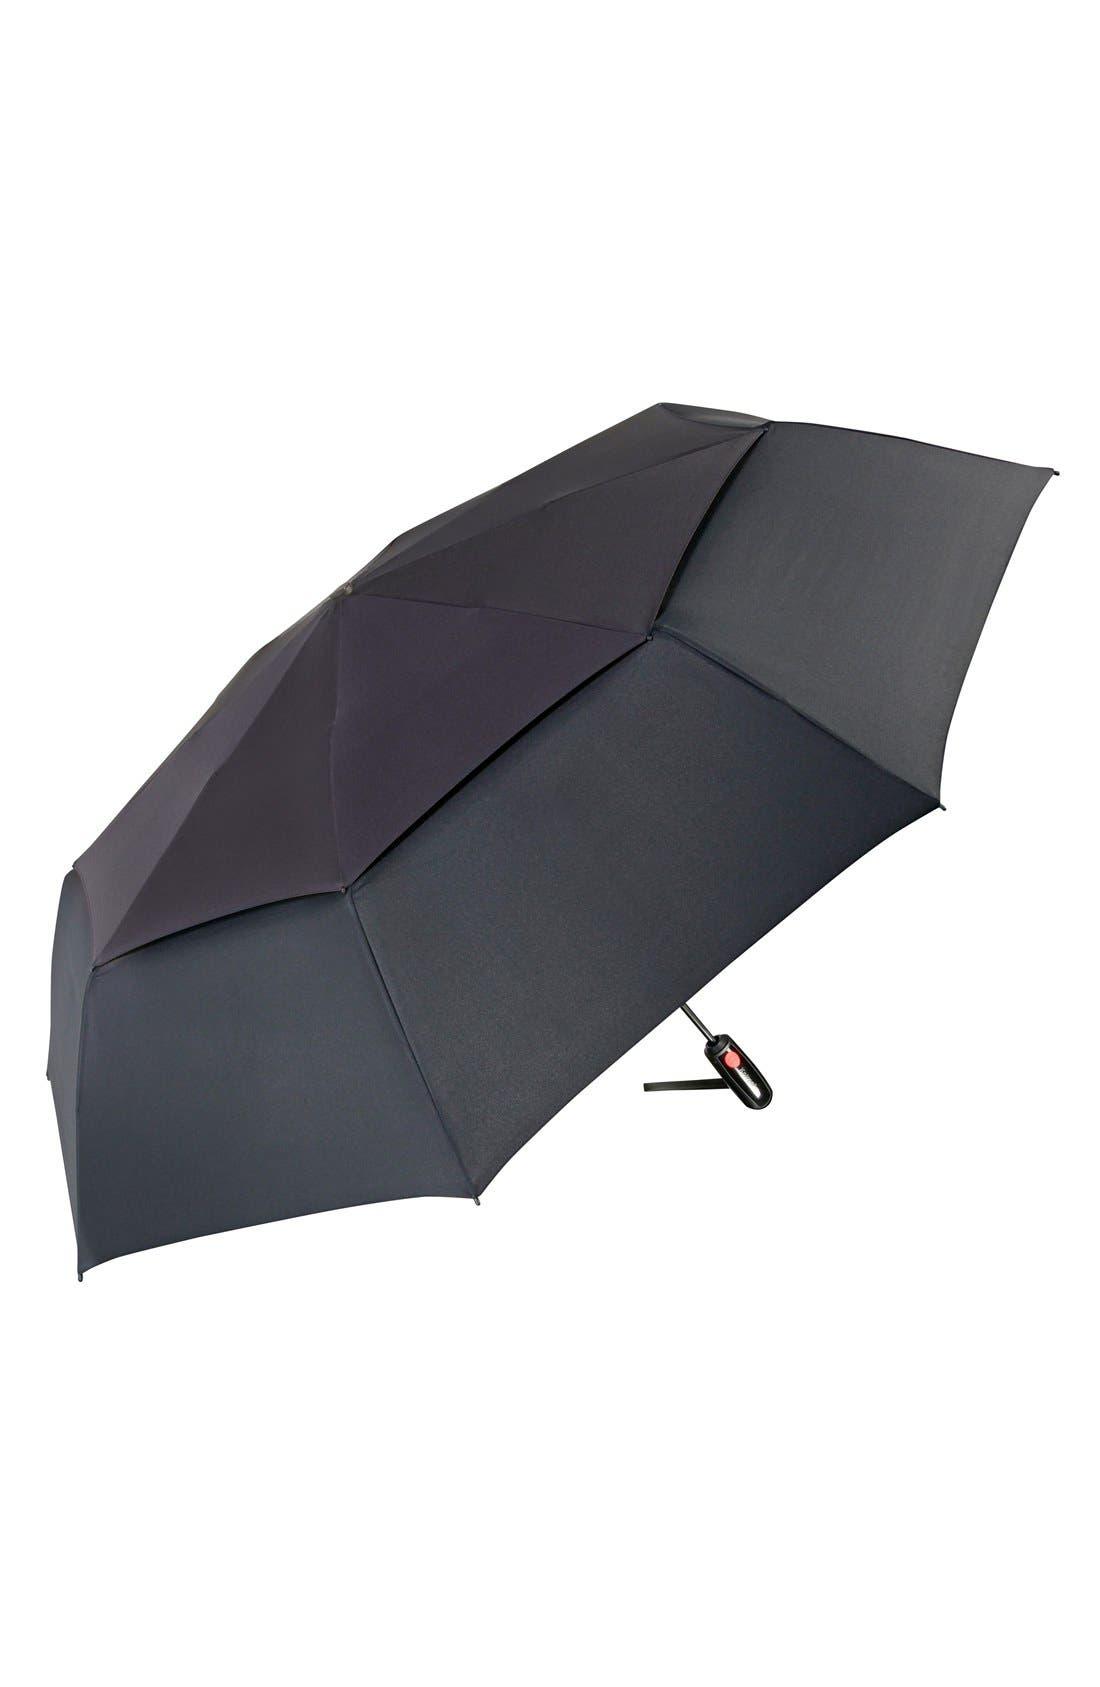 'Xtreme Duomatic' Umbrella,                             Main thumbnail 1, color,                             BLACK